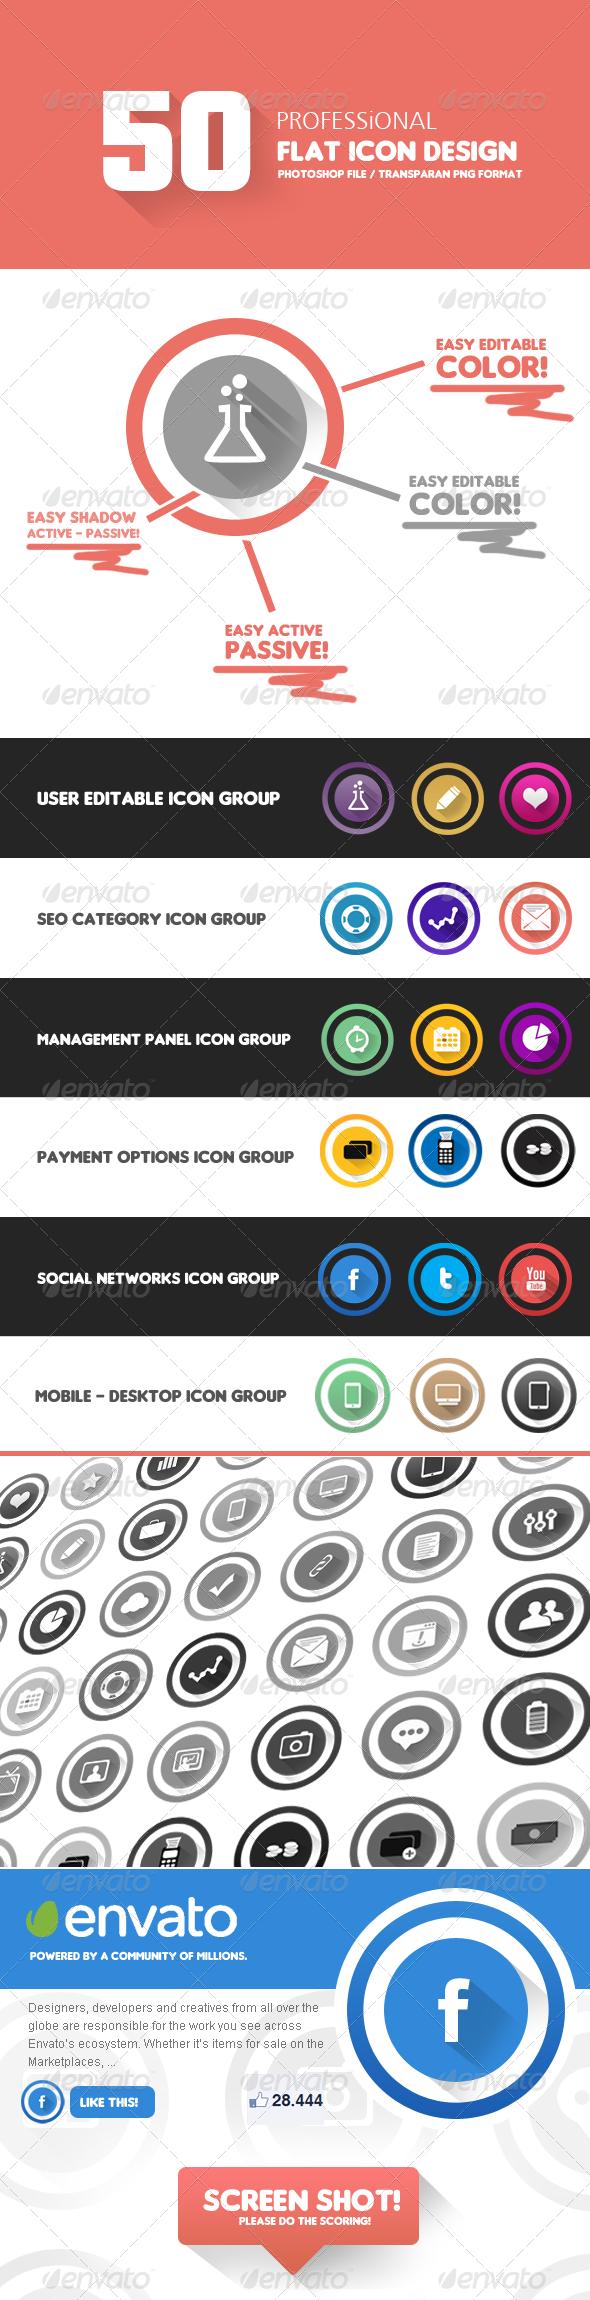 50 Piece Flat icon Design Kit - V1 - Icons